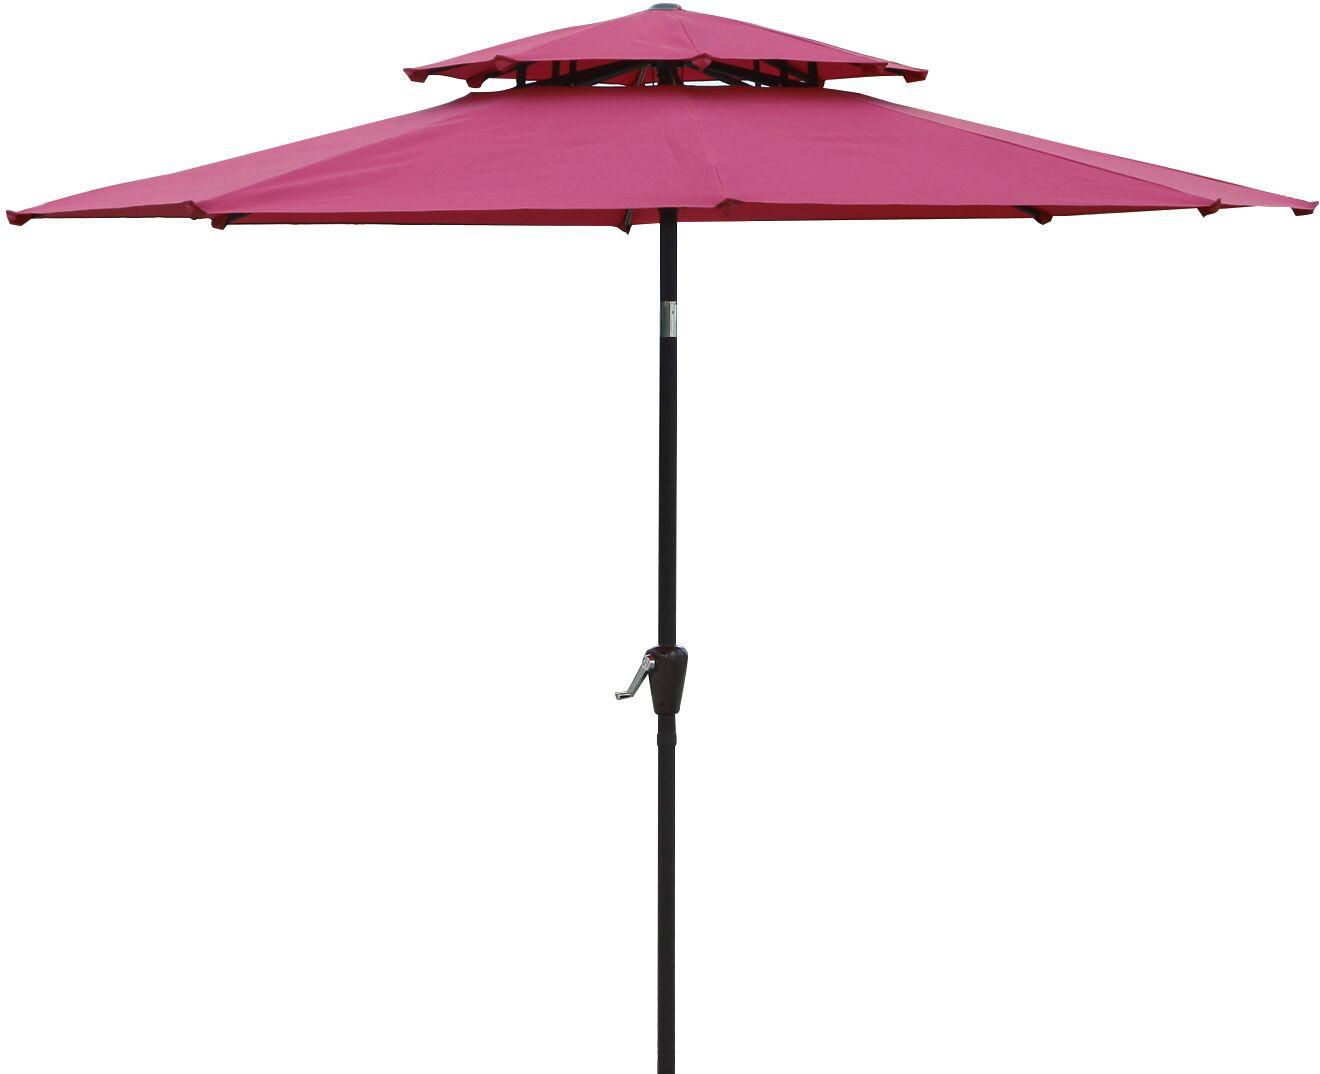 Dimond 9' Market Umbrella Fabric: Wine Red